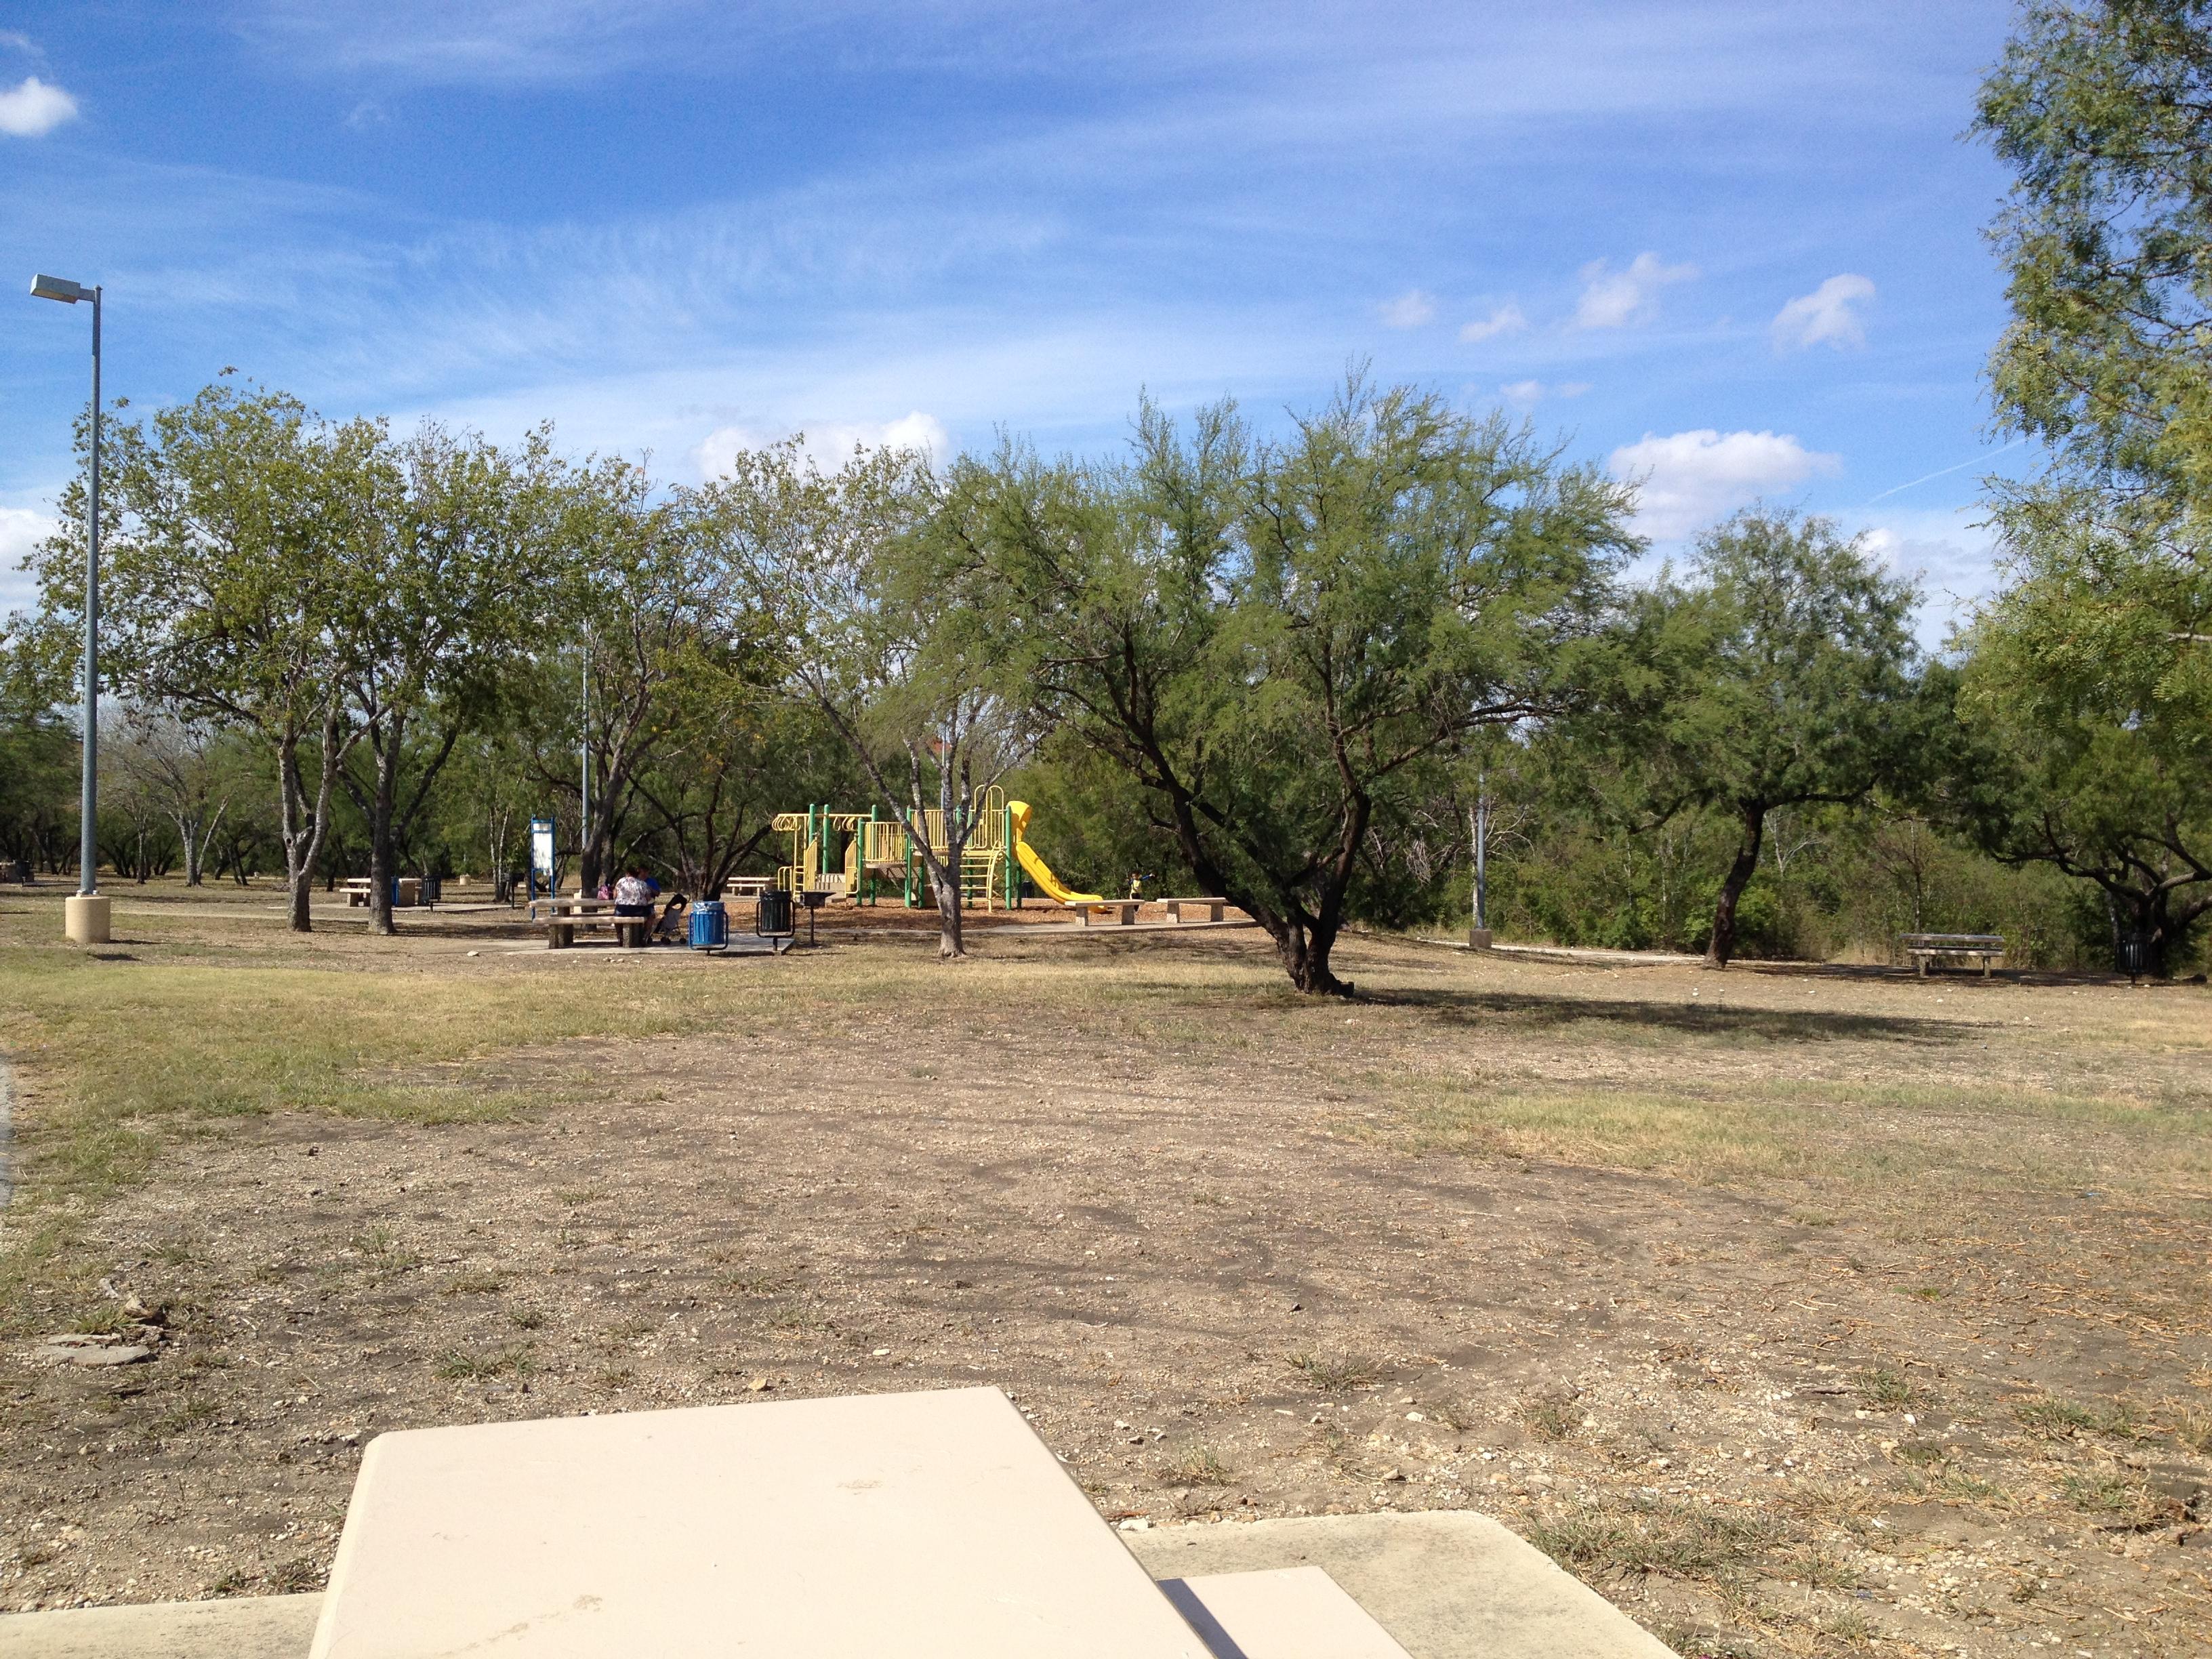 Pytel (Park Ranger Paul M.) Park - The City of San Antonio ...